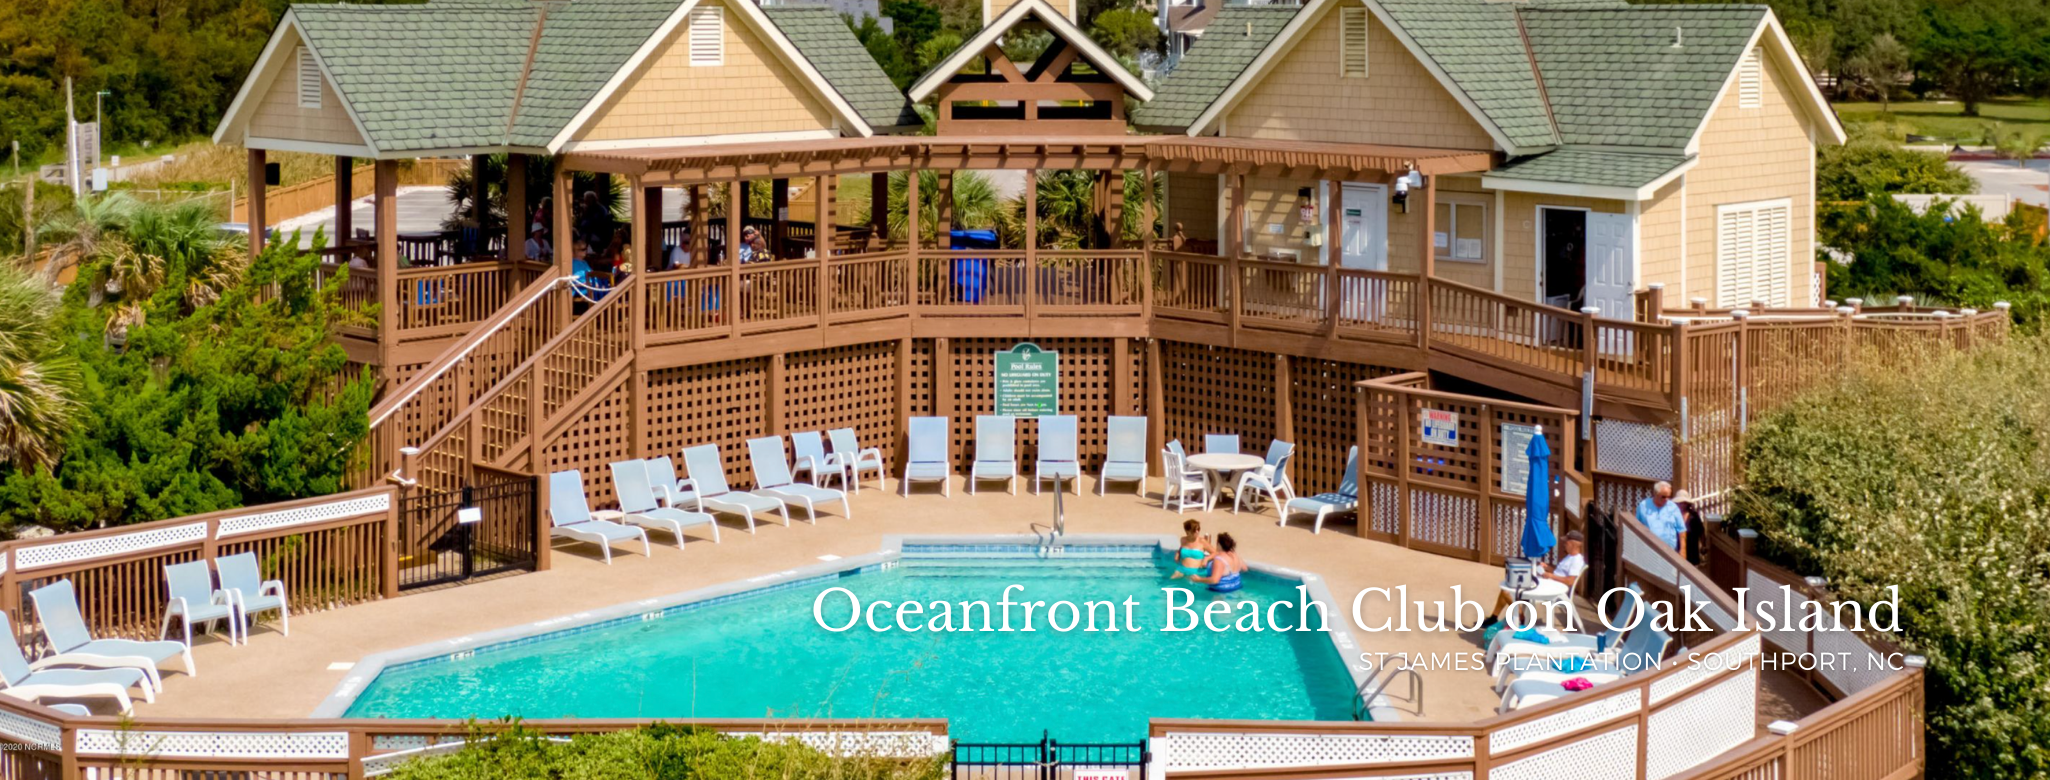 Oceanfront Beach Club on Oak Island in St James Plantation